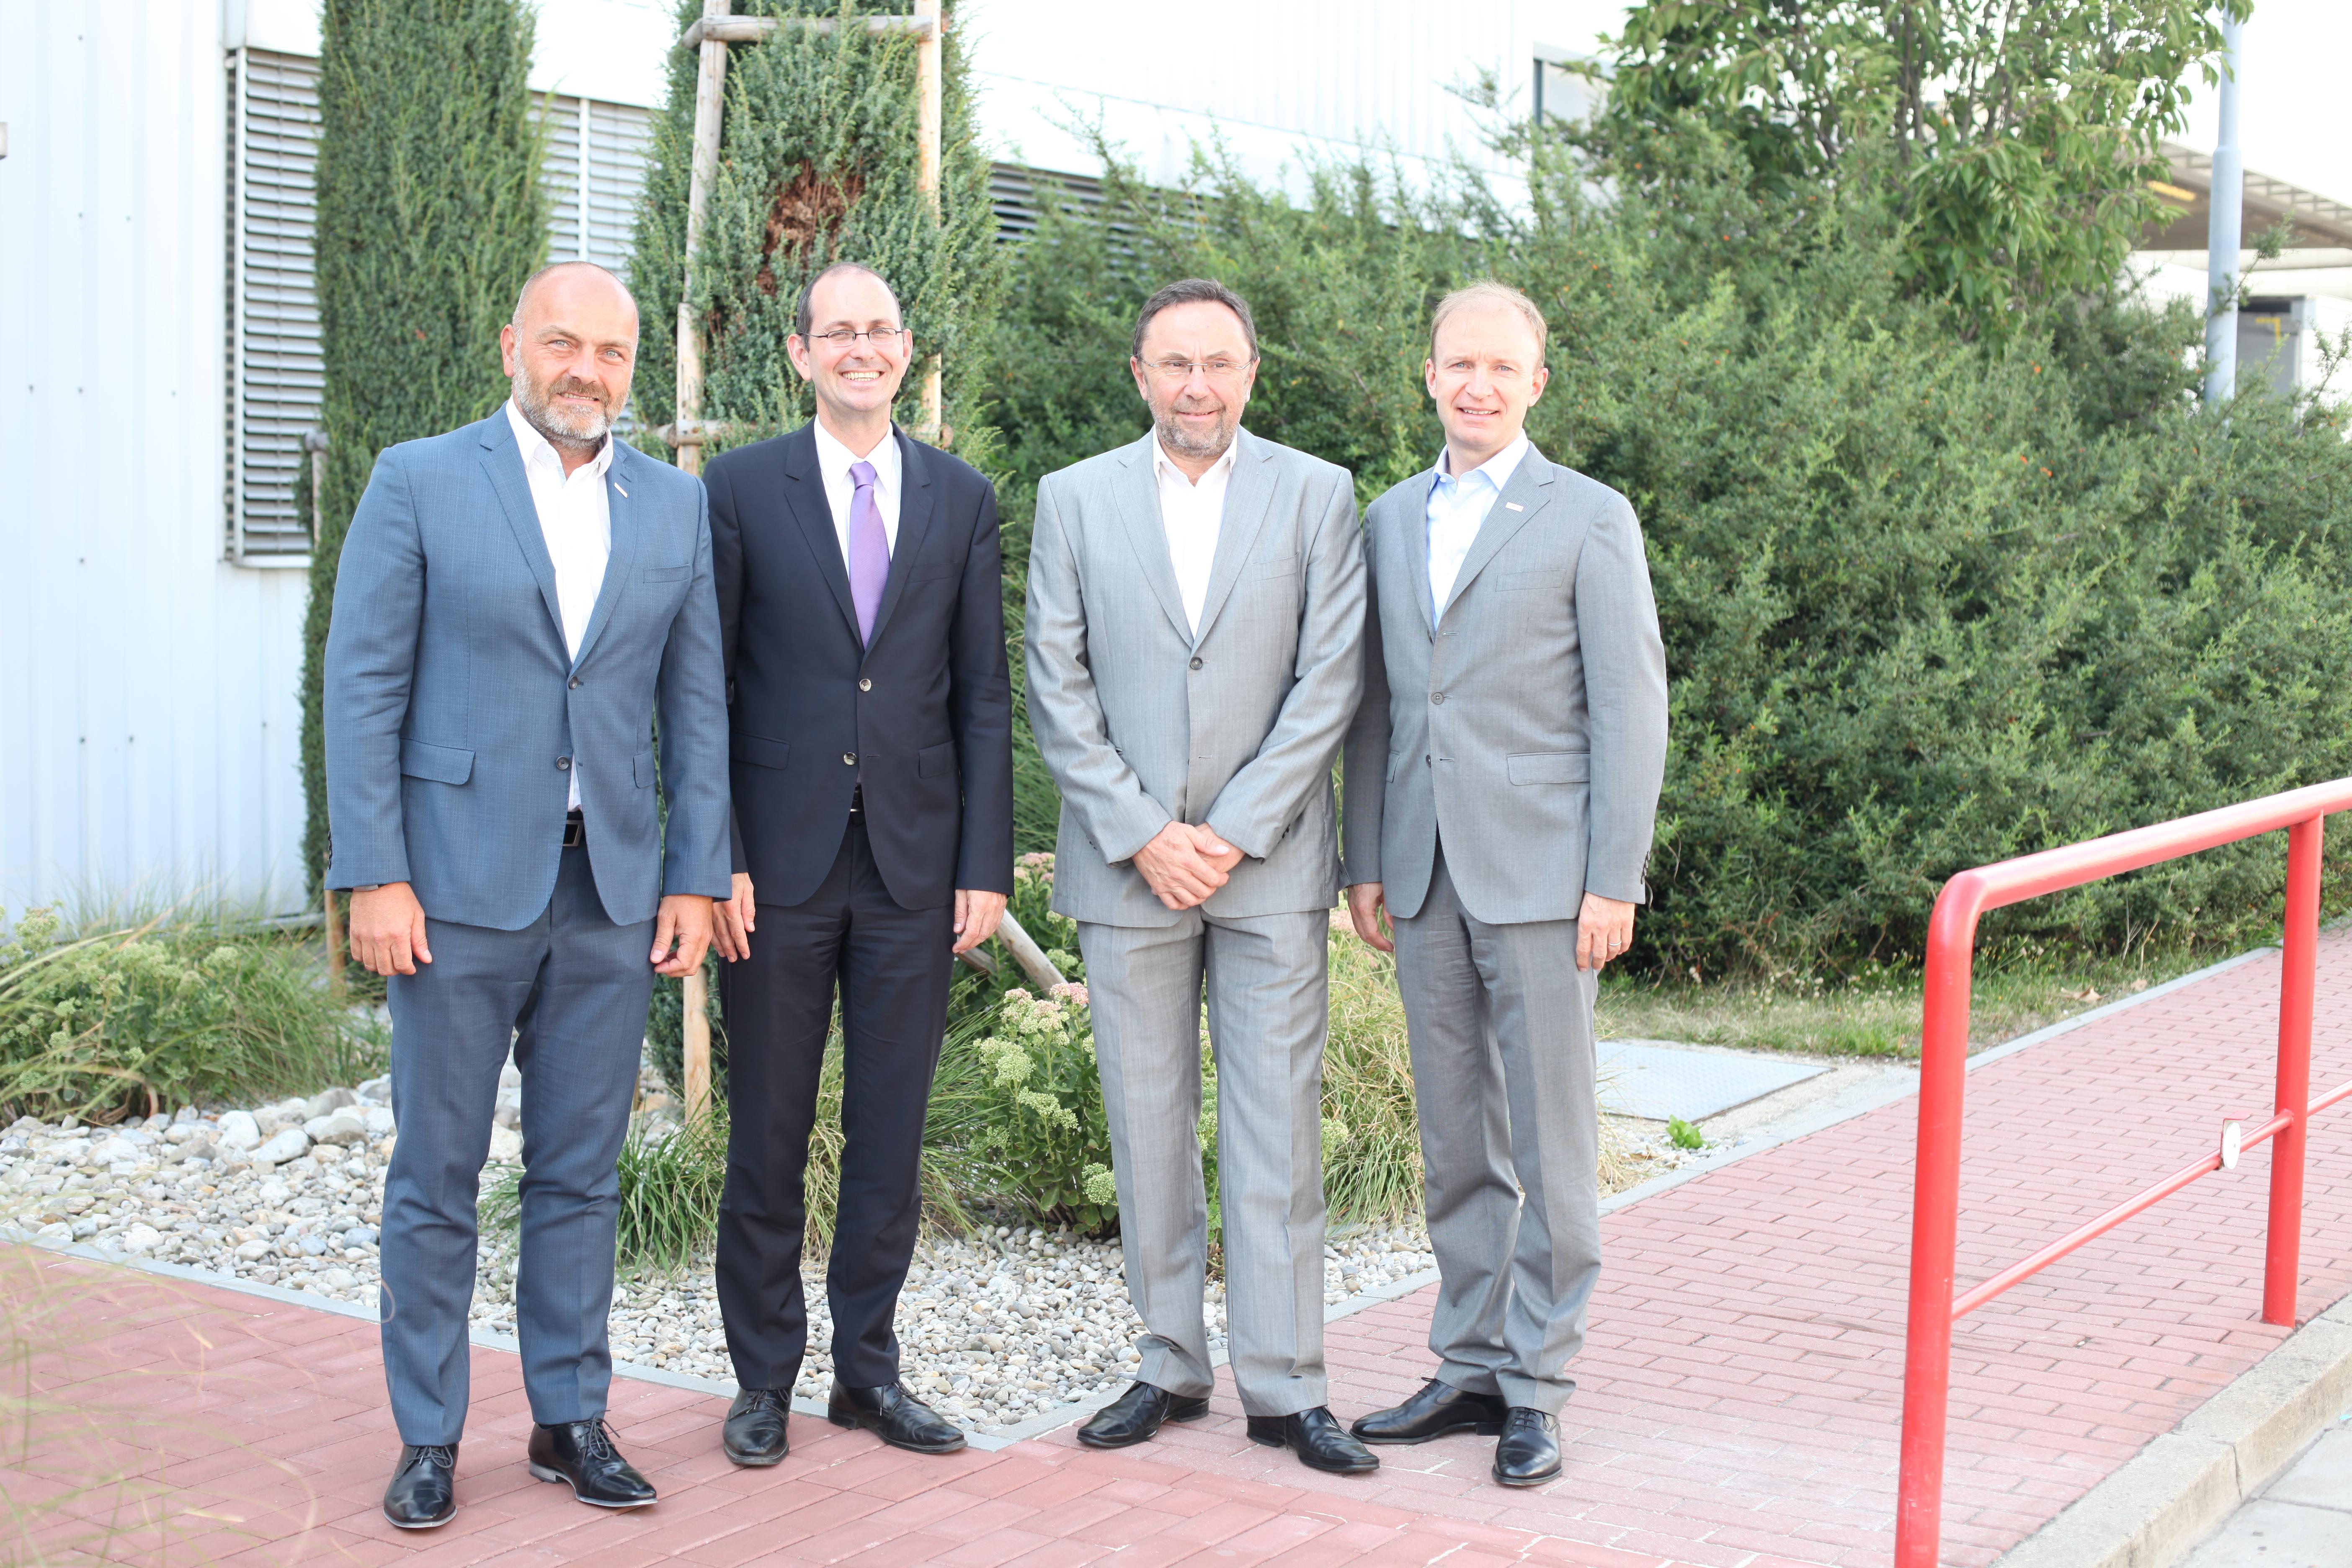 Zleva Milan Šlachta, Dr. Christoph Israng, Václav Pixa, Kai Frericks